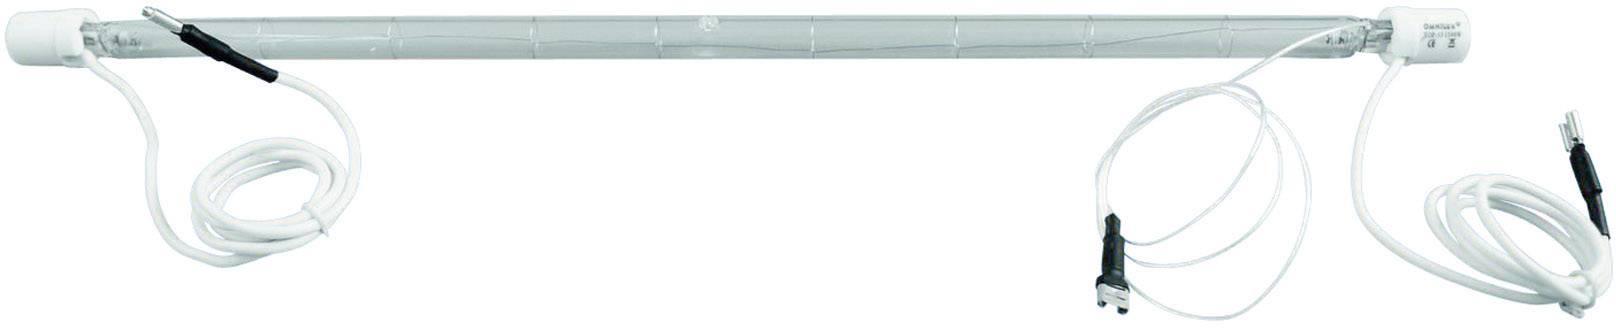 Náhradní záblesková výbojka Eurolite, 1500 W